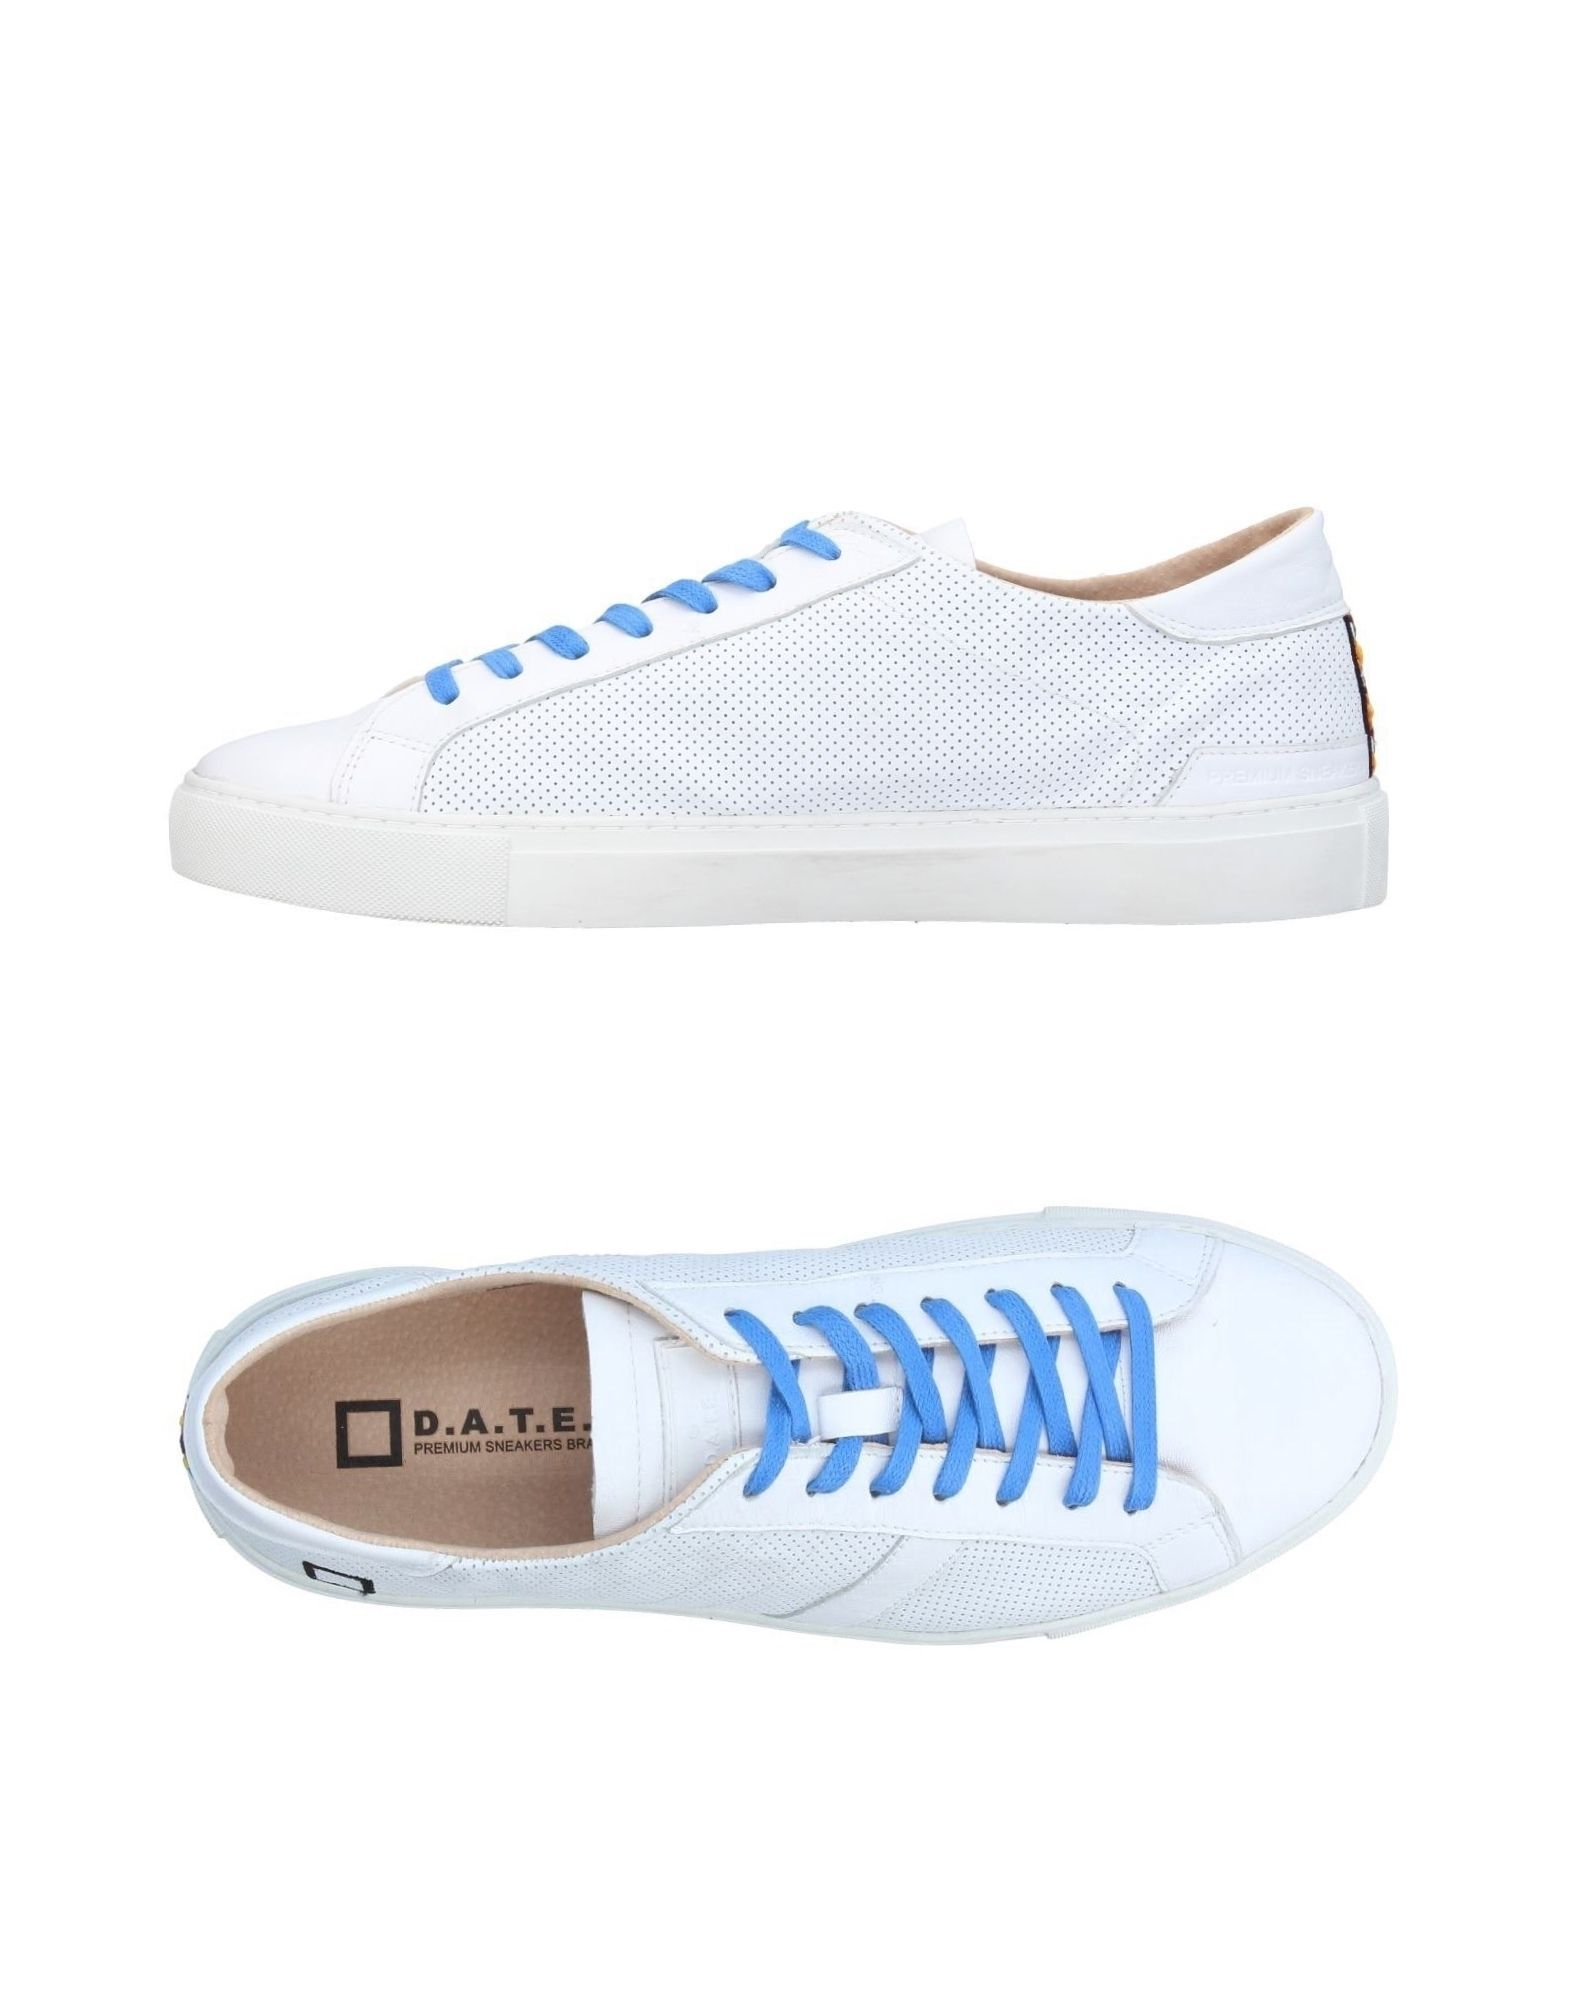 D.A.T.E. Низкие кеды и кроссовки